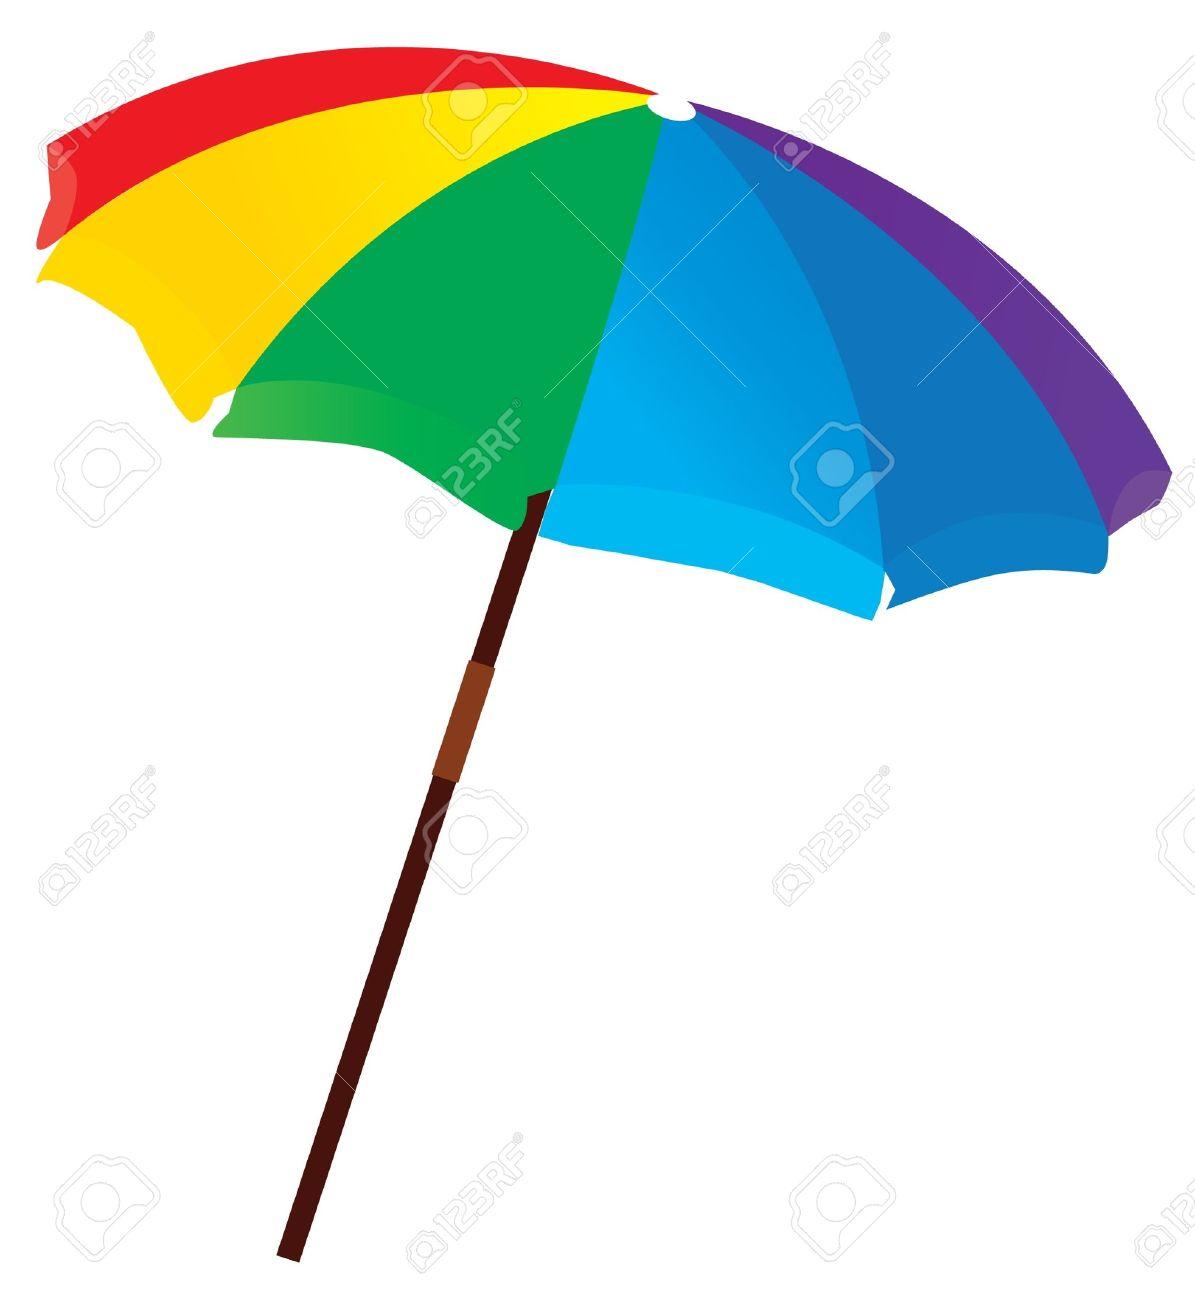 beach chair and umbrella clipart bathtub for elderly parasol clipground